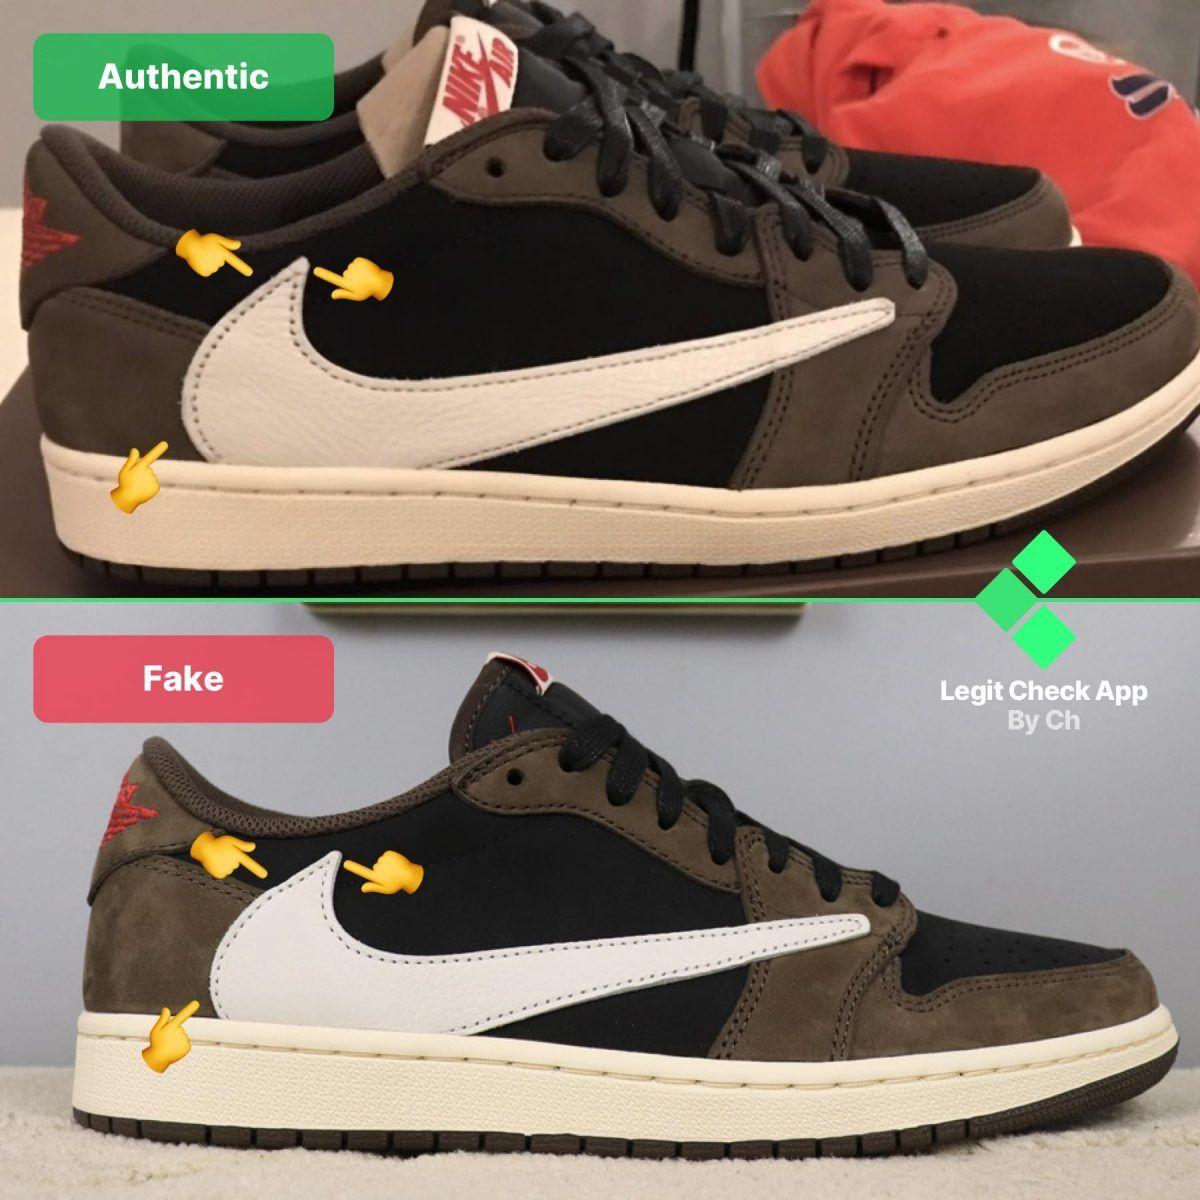 AJ1 TS Low Fake vs Real Guide - Reverse